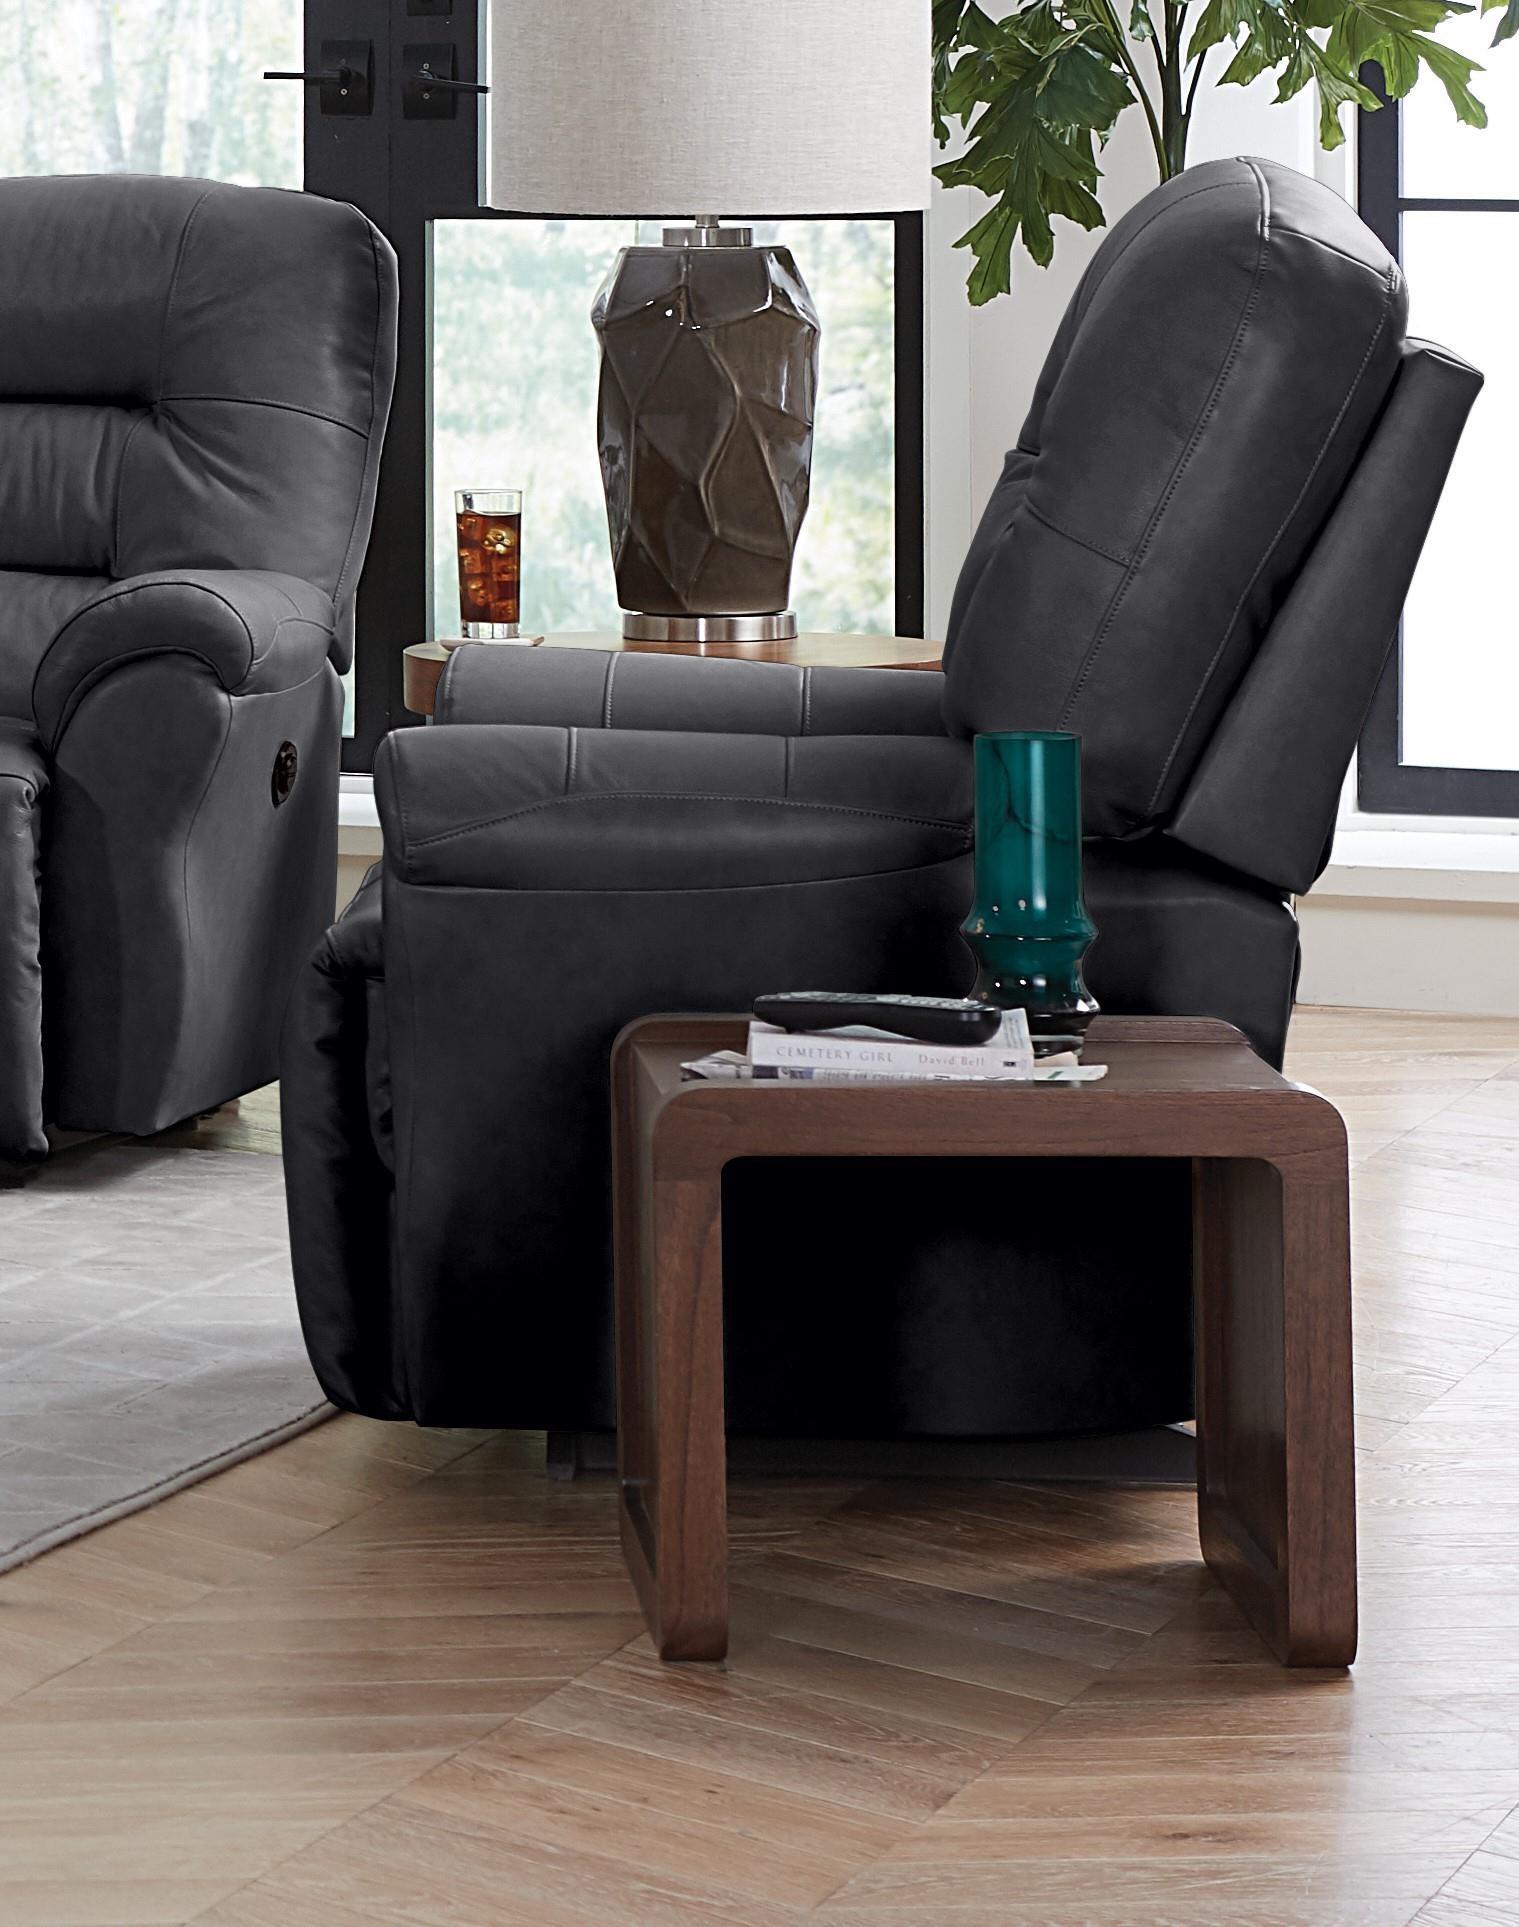 Unity Rocker Recliner by Best Home Furnishings at Furniture Fair - North Carolina